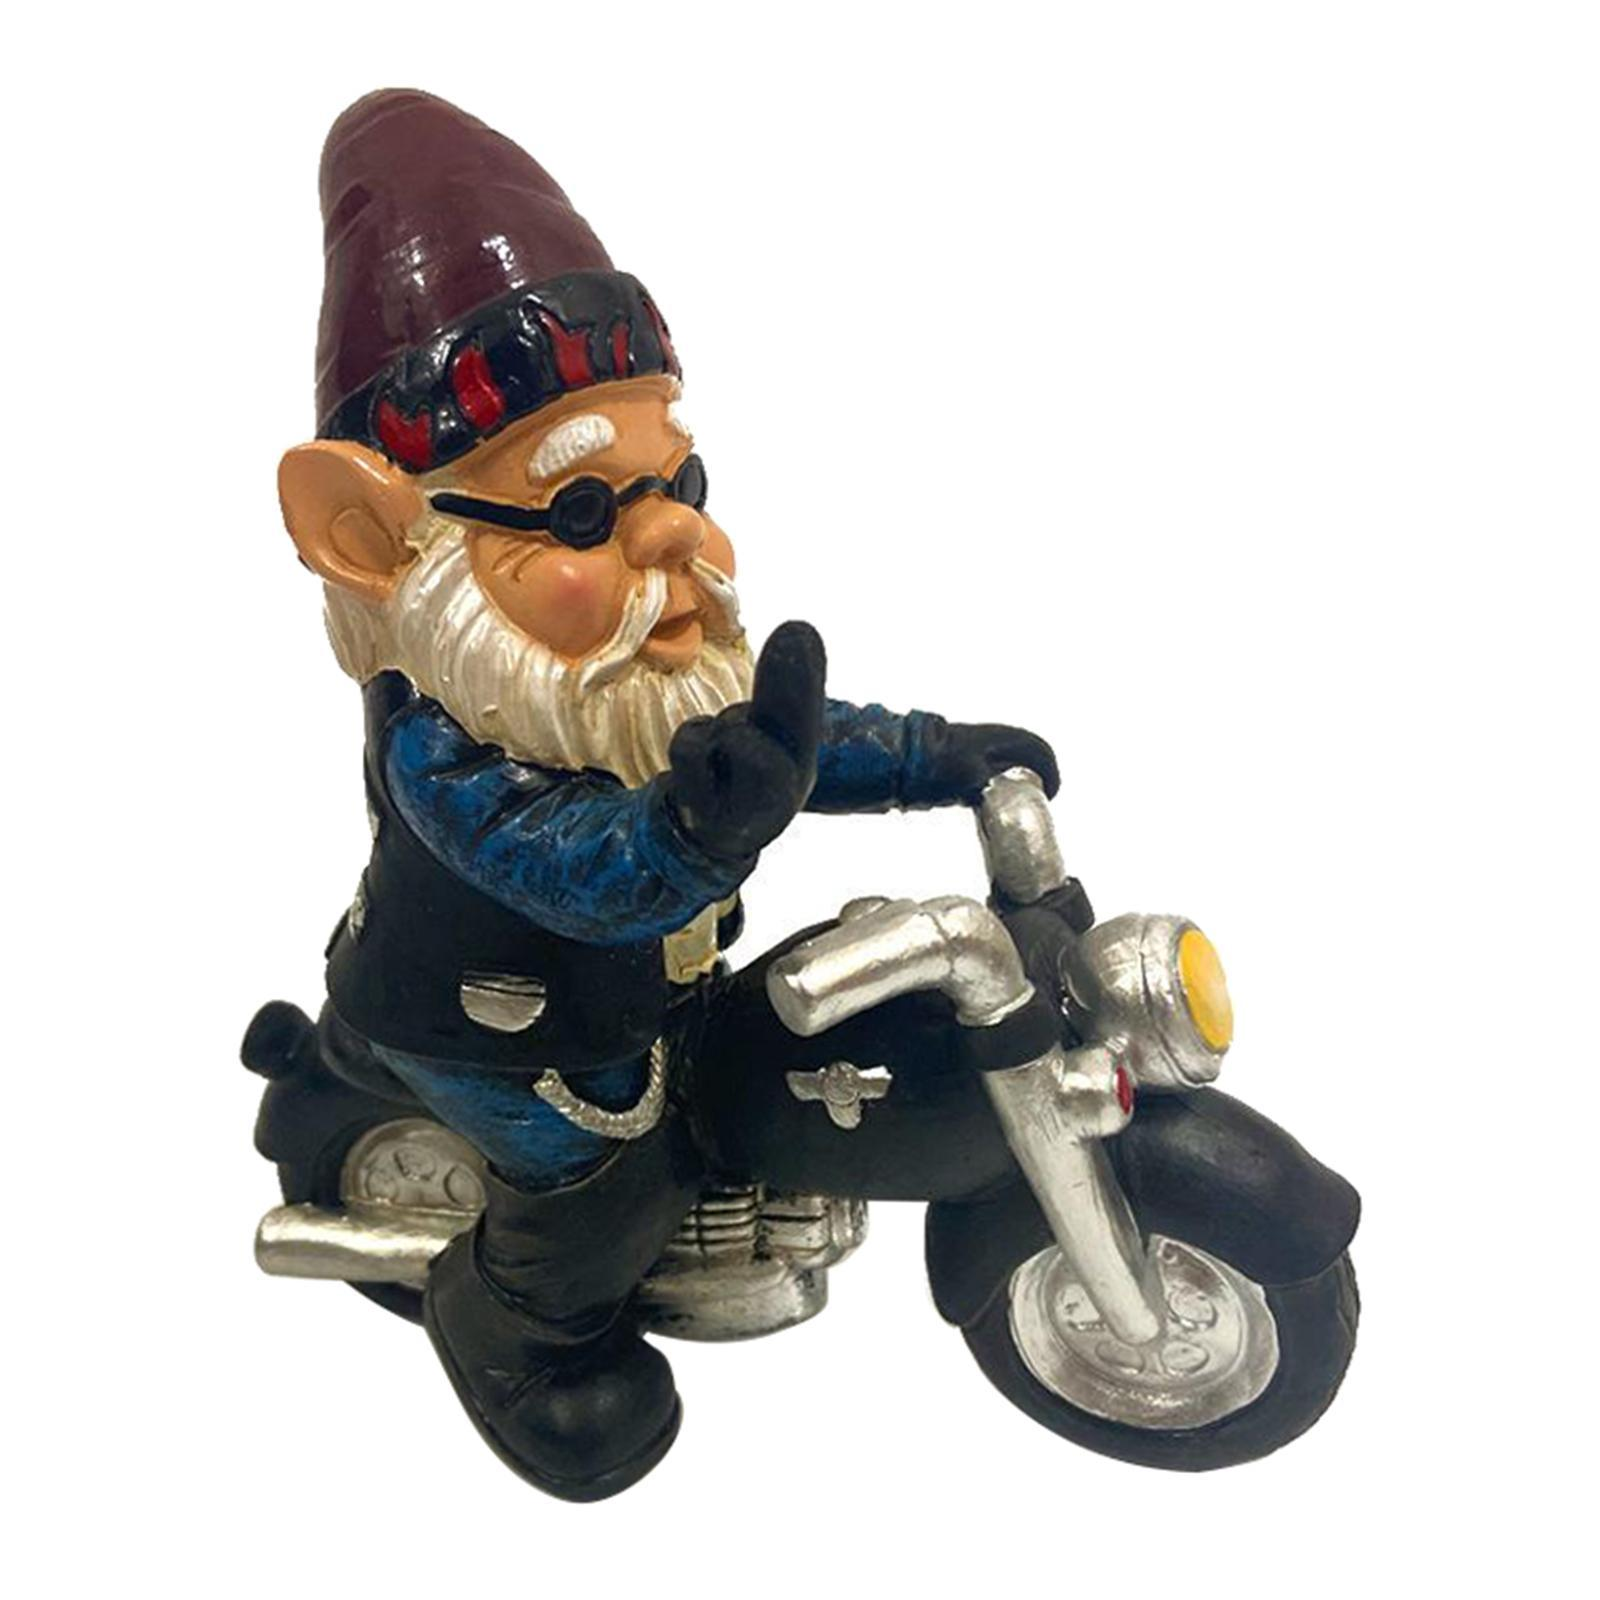 thumbnail 25 - Funny Resin Naughty Garden Gnome Statue Ornaments Outdoor Villa Home Figurines